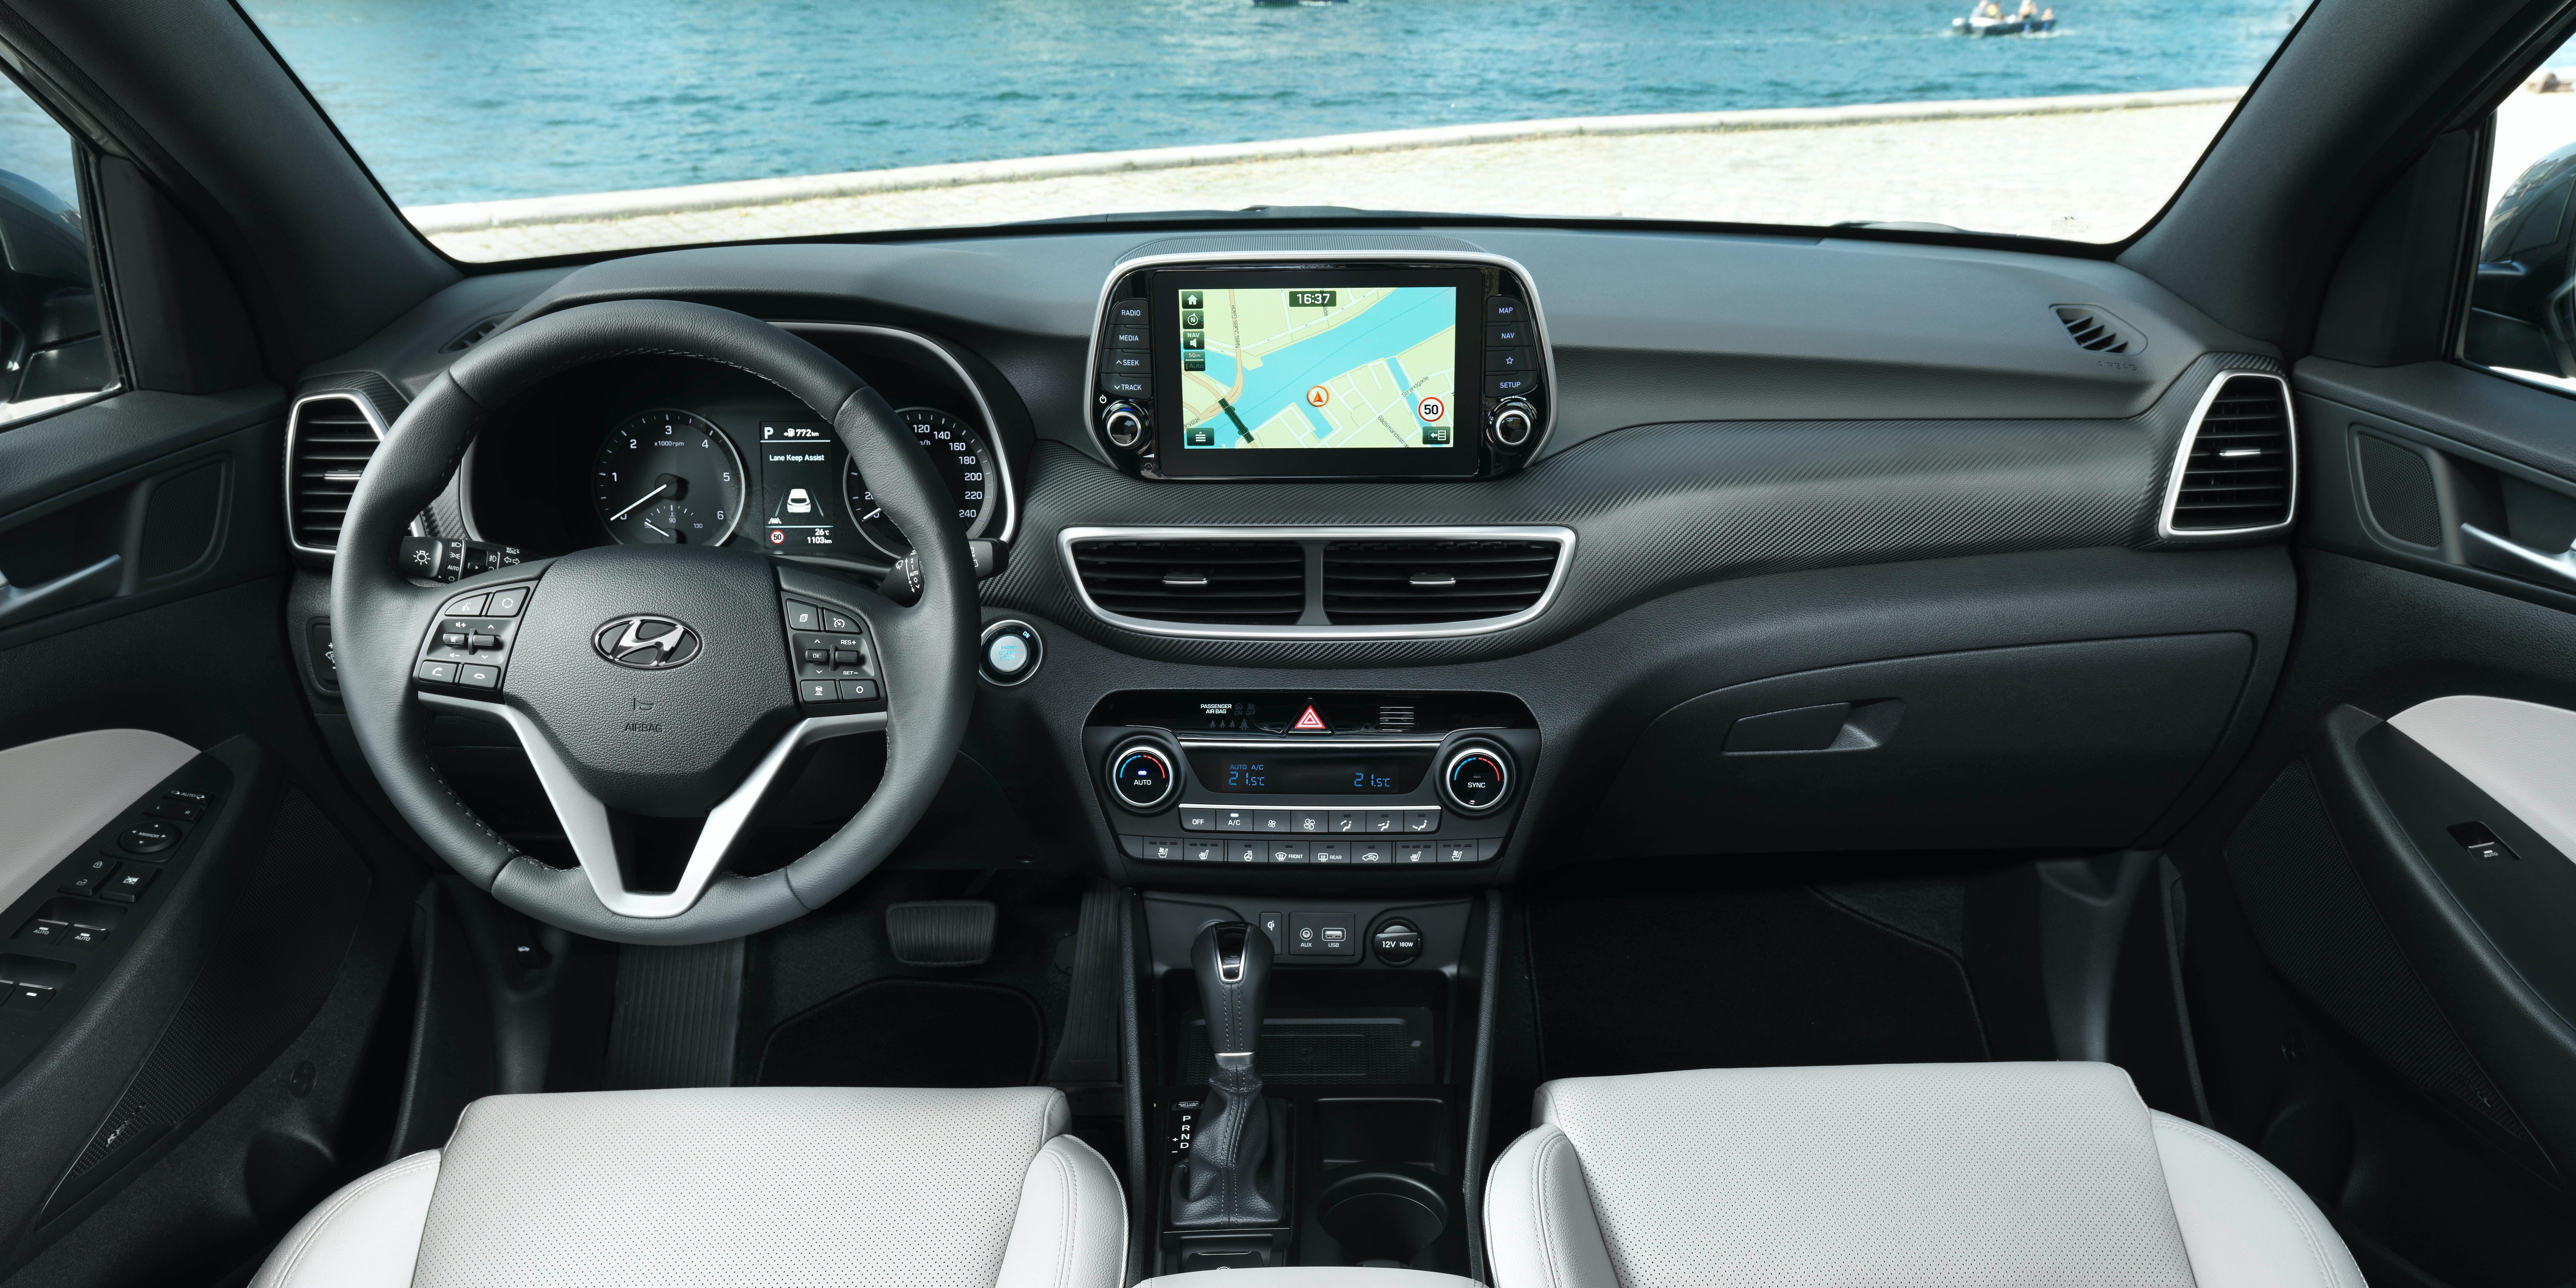 Hyundai Tucson Interior & Infotainment | carwow